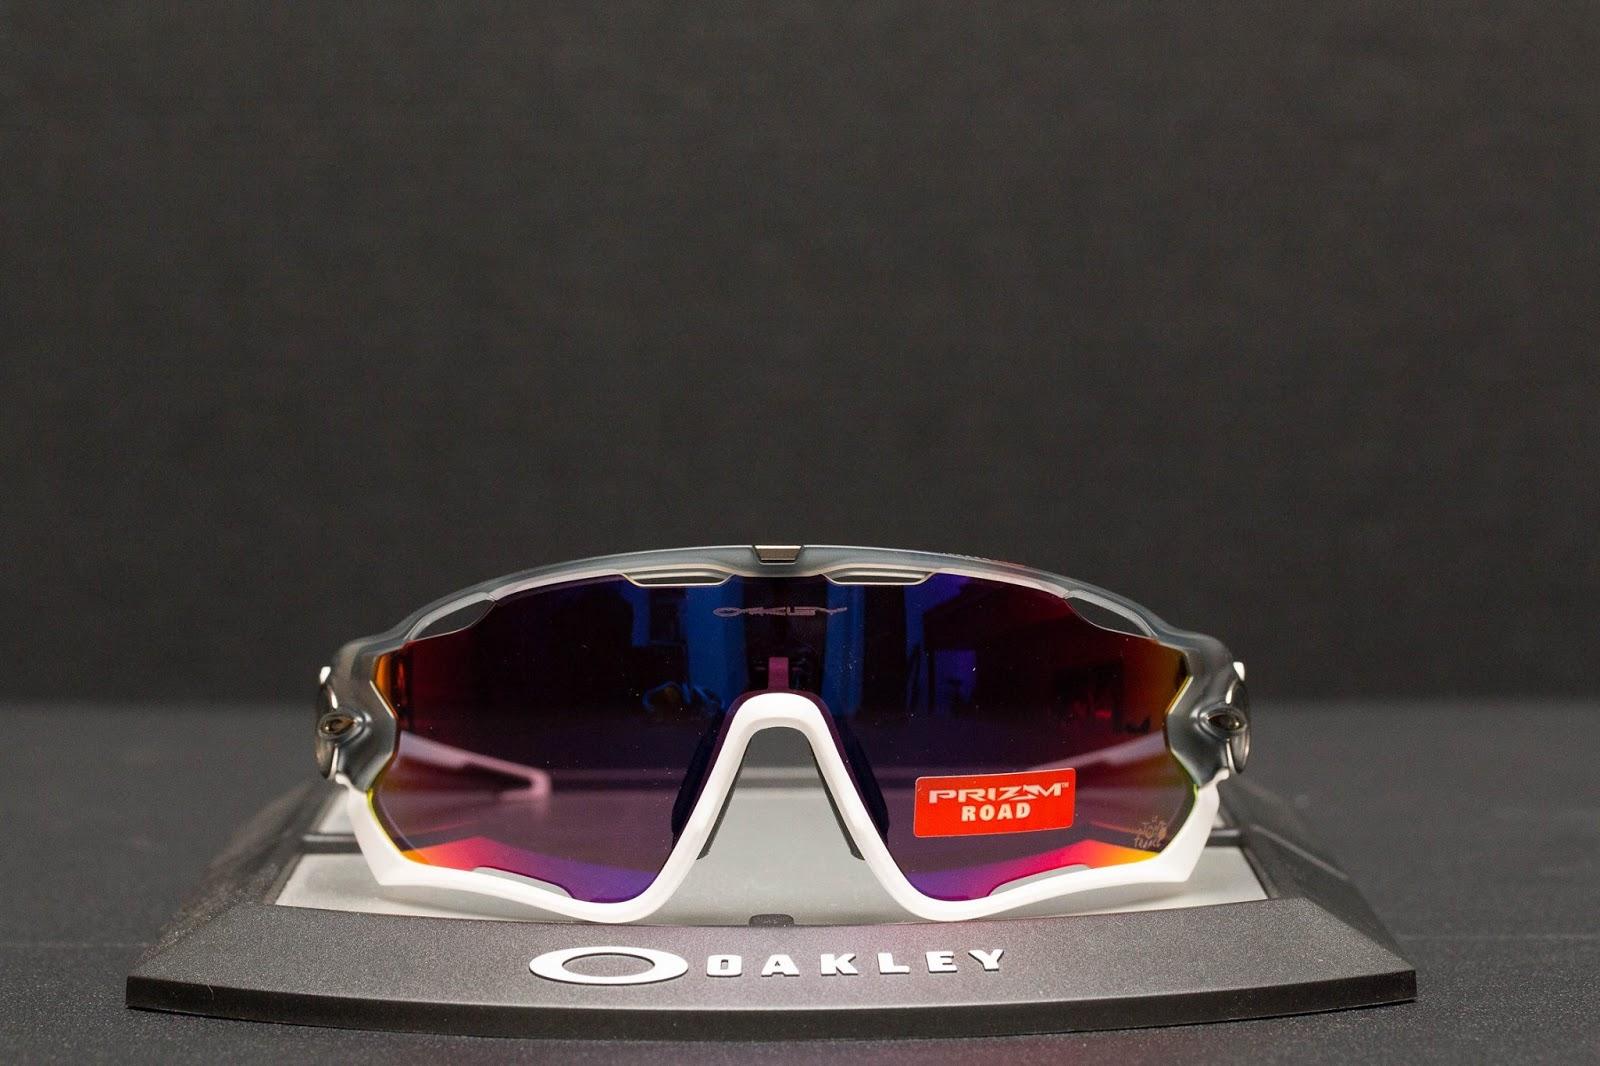 87d05d2e02 Oakley jawbreaker edition tdf // lanwalldeness.ga